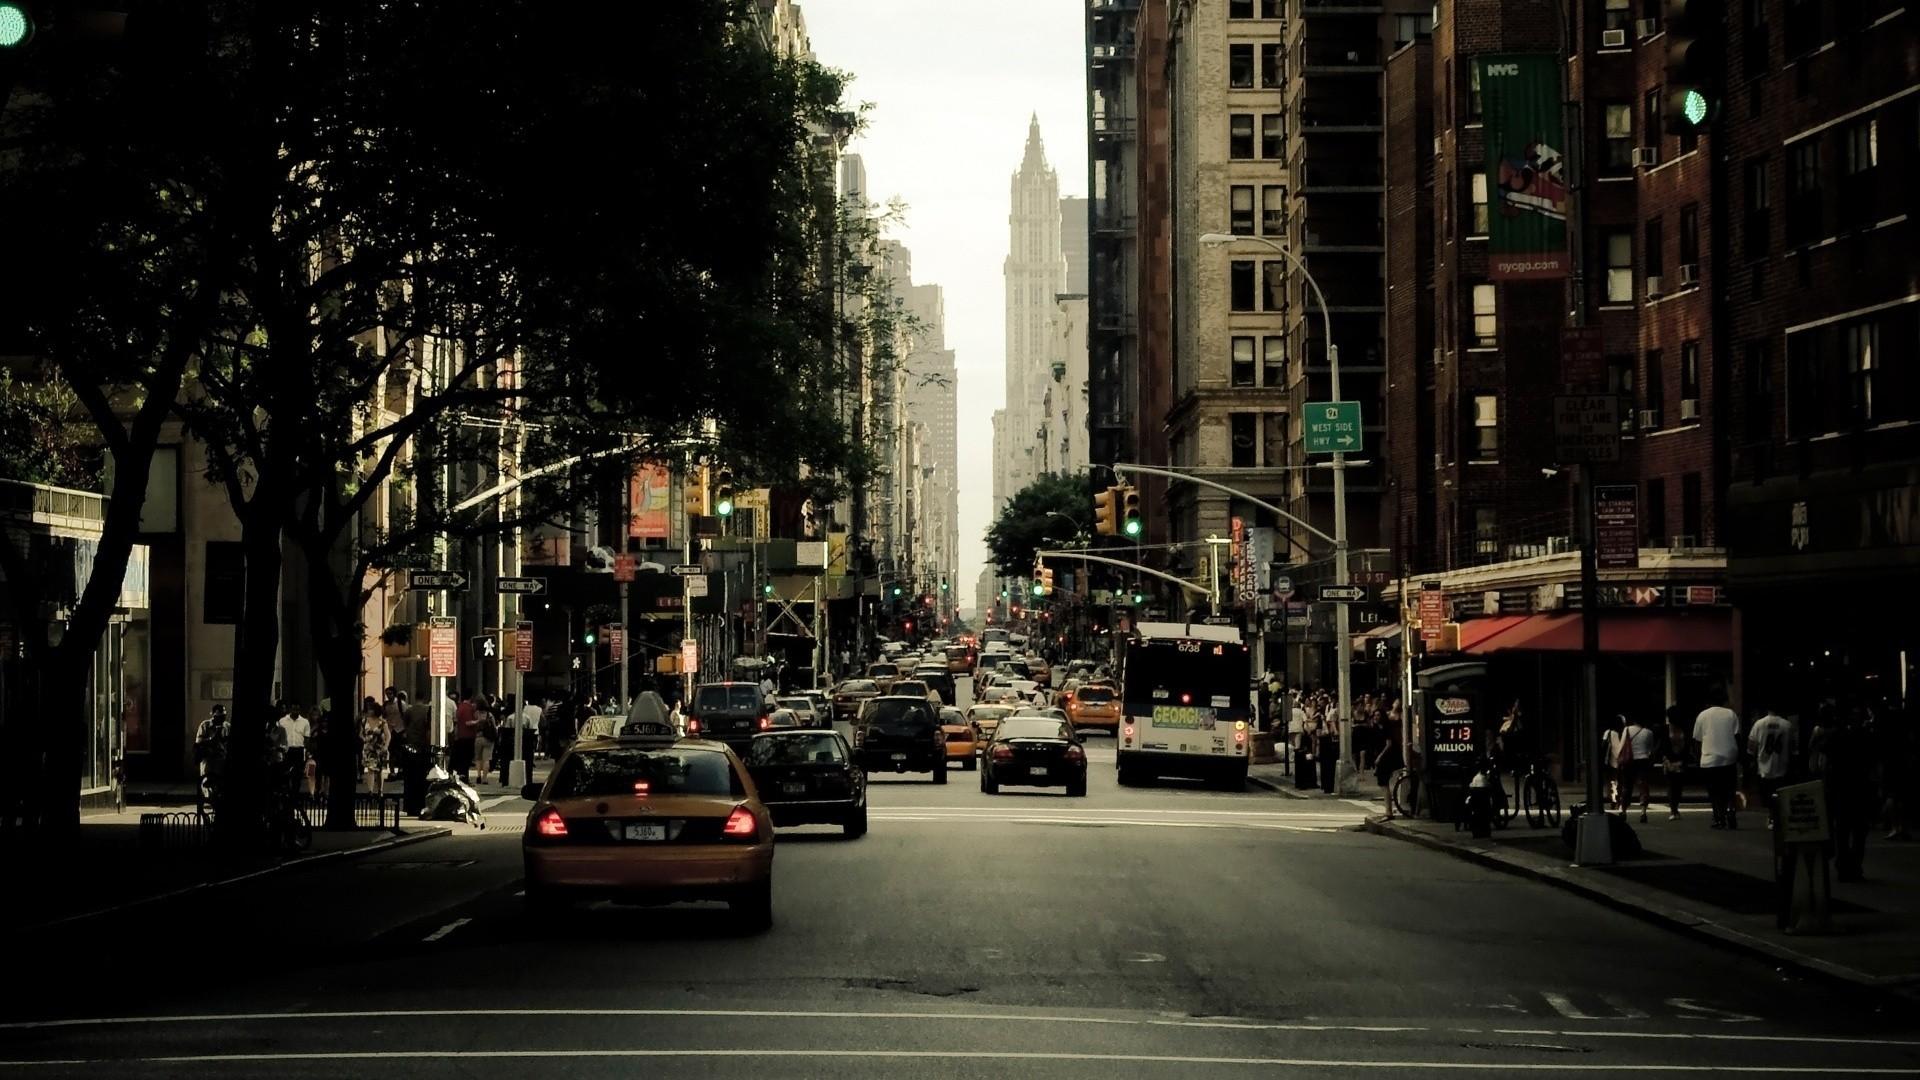 New York Hd Wallpaper Background Image 1920x1080 Id